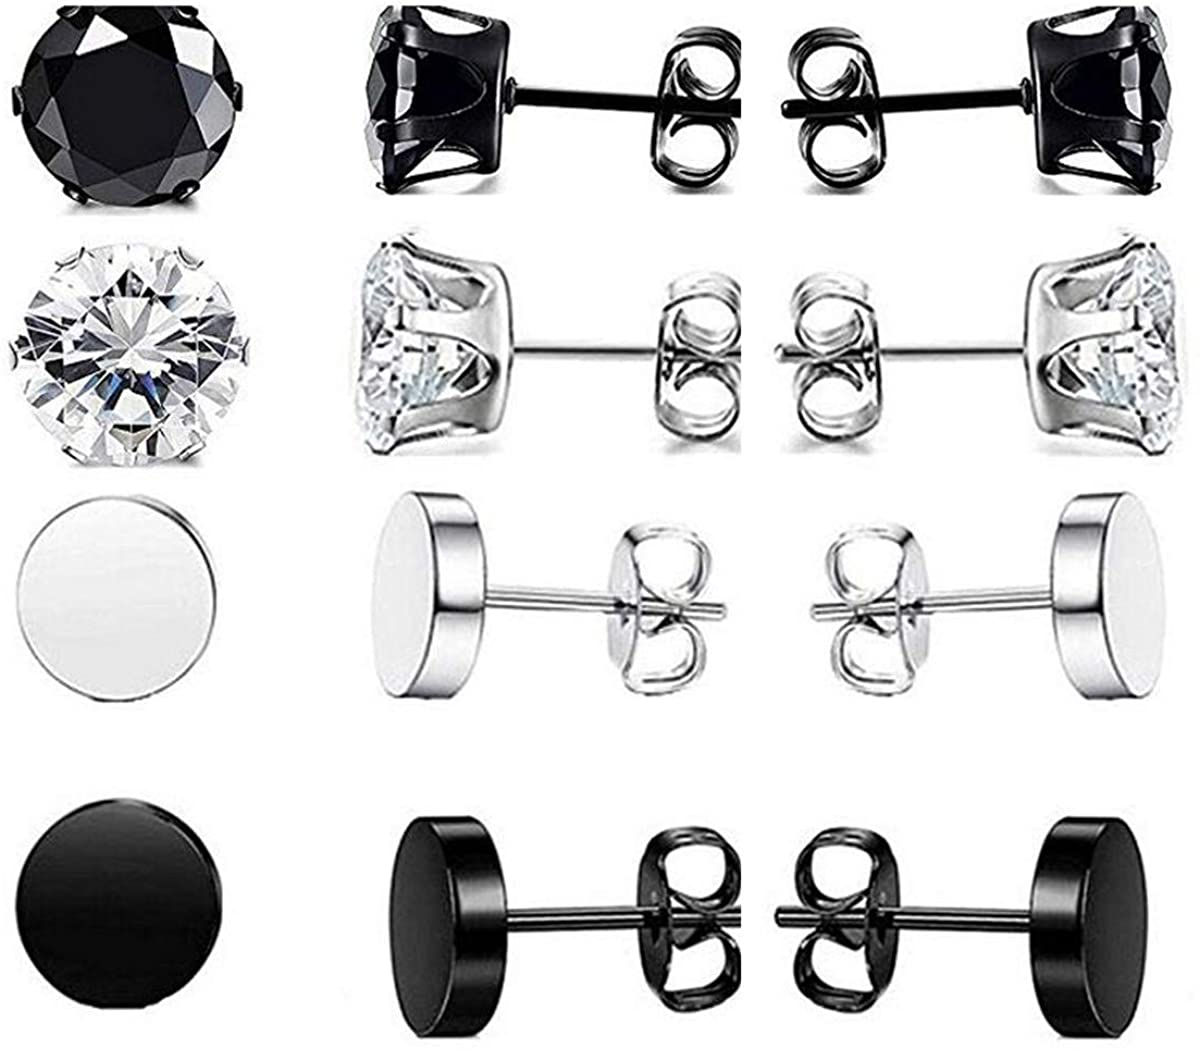 4 Pairs Stainless Steel Stud Earrings for Men Women CZ Round Earrings 8mm(Black Silver)